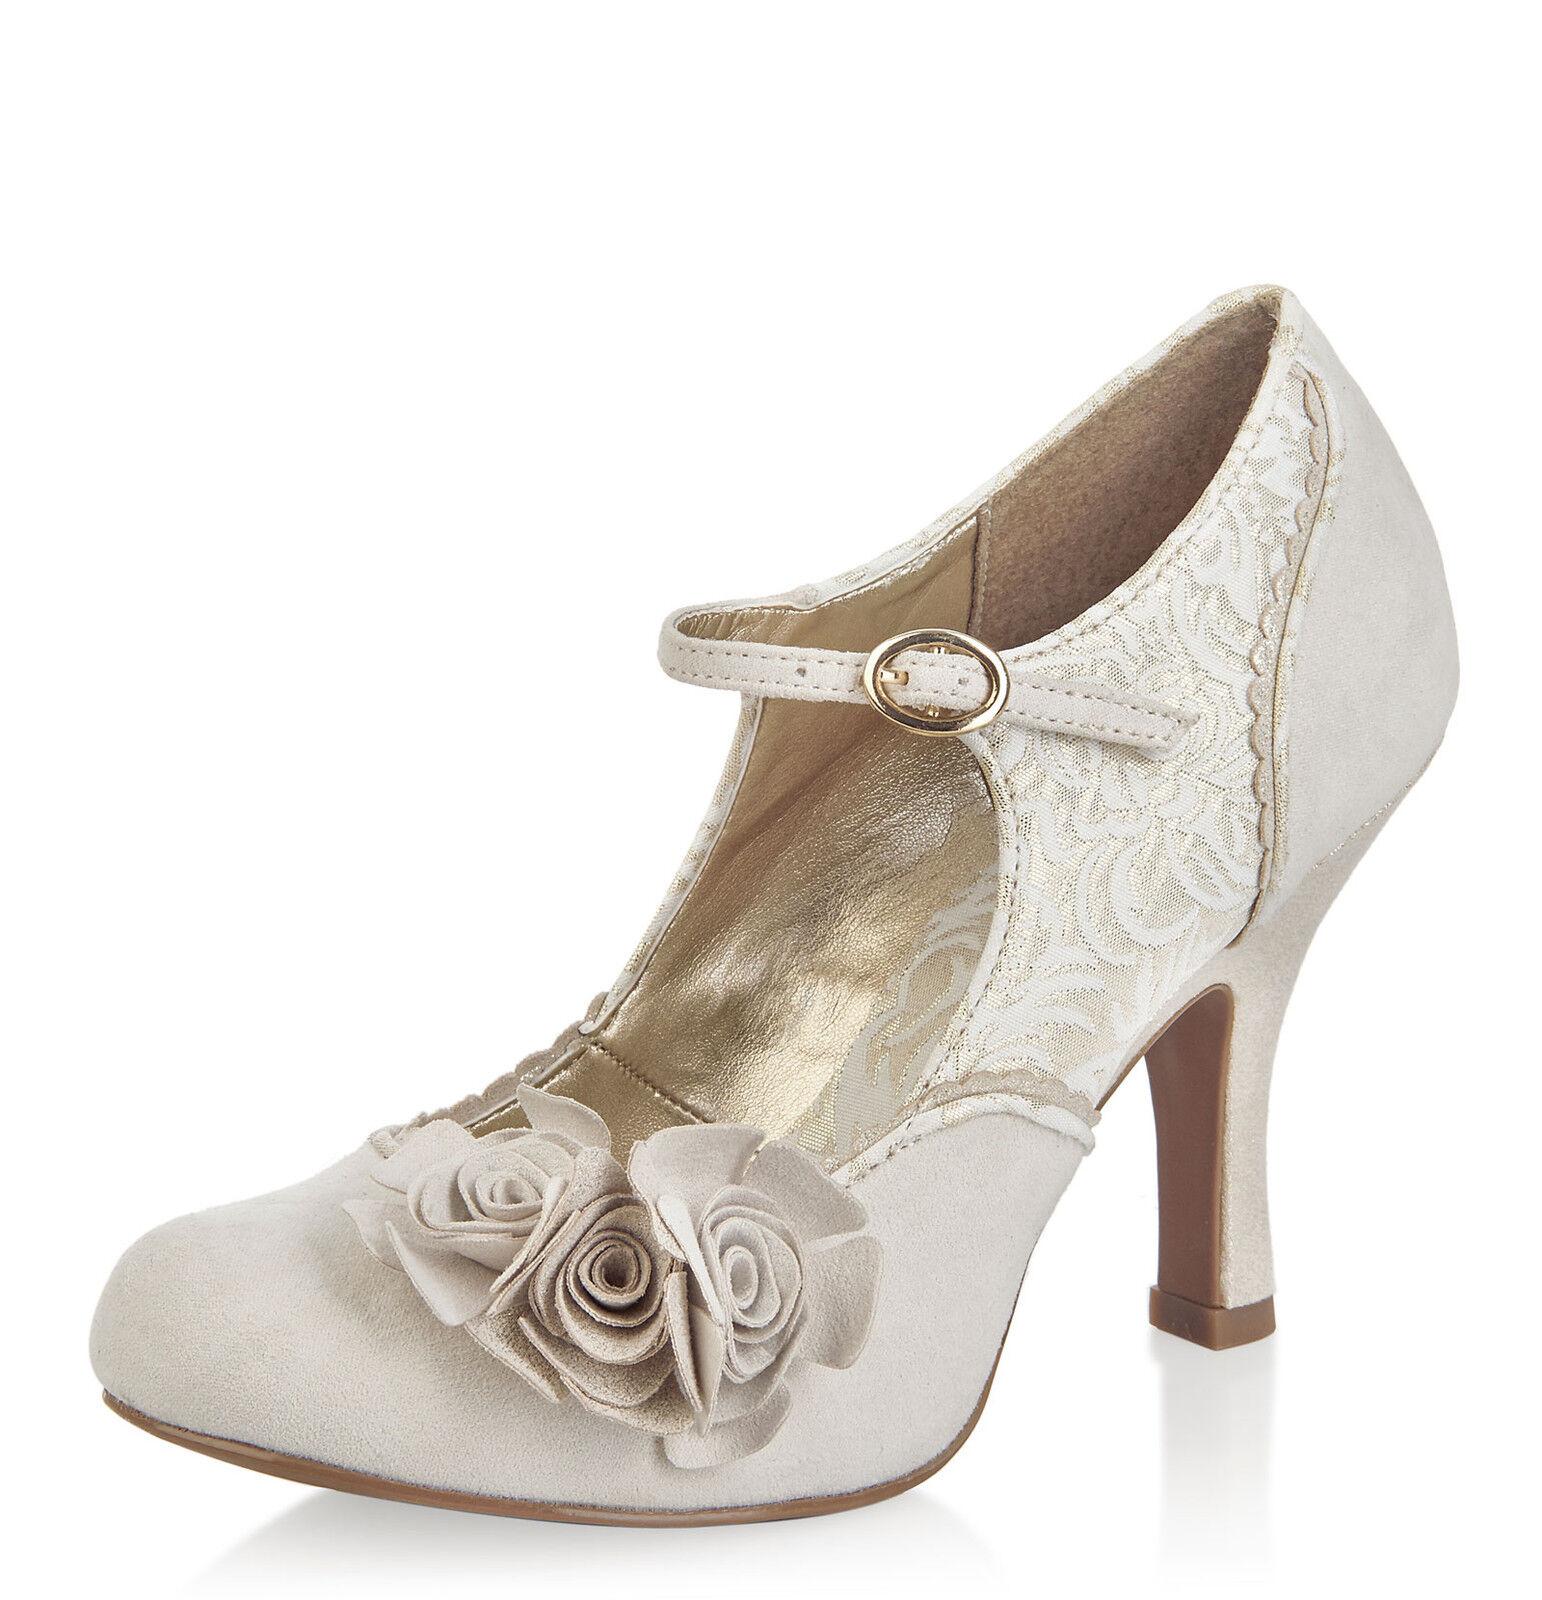 RUBY SHOO EMILY CREAM GOLD FLOWER MARY JANE VINTAGE BRIDAL HIGH HEEL SHOES 3-9